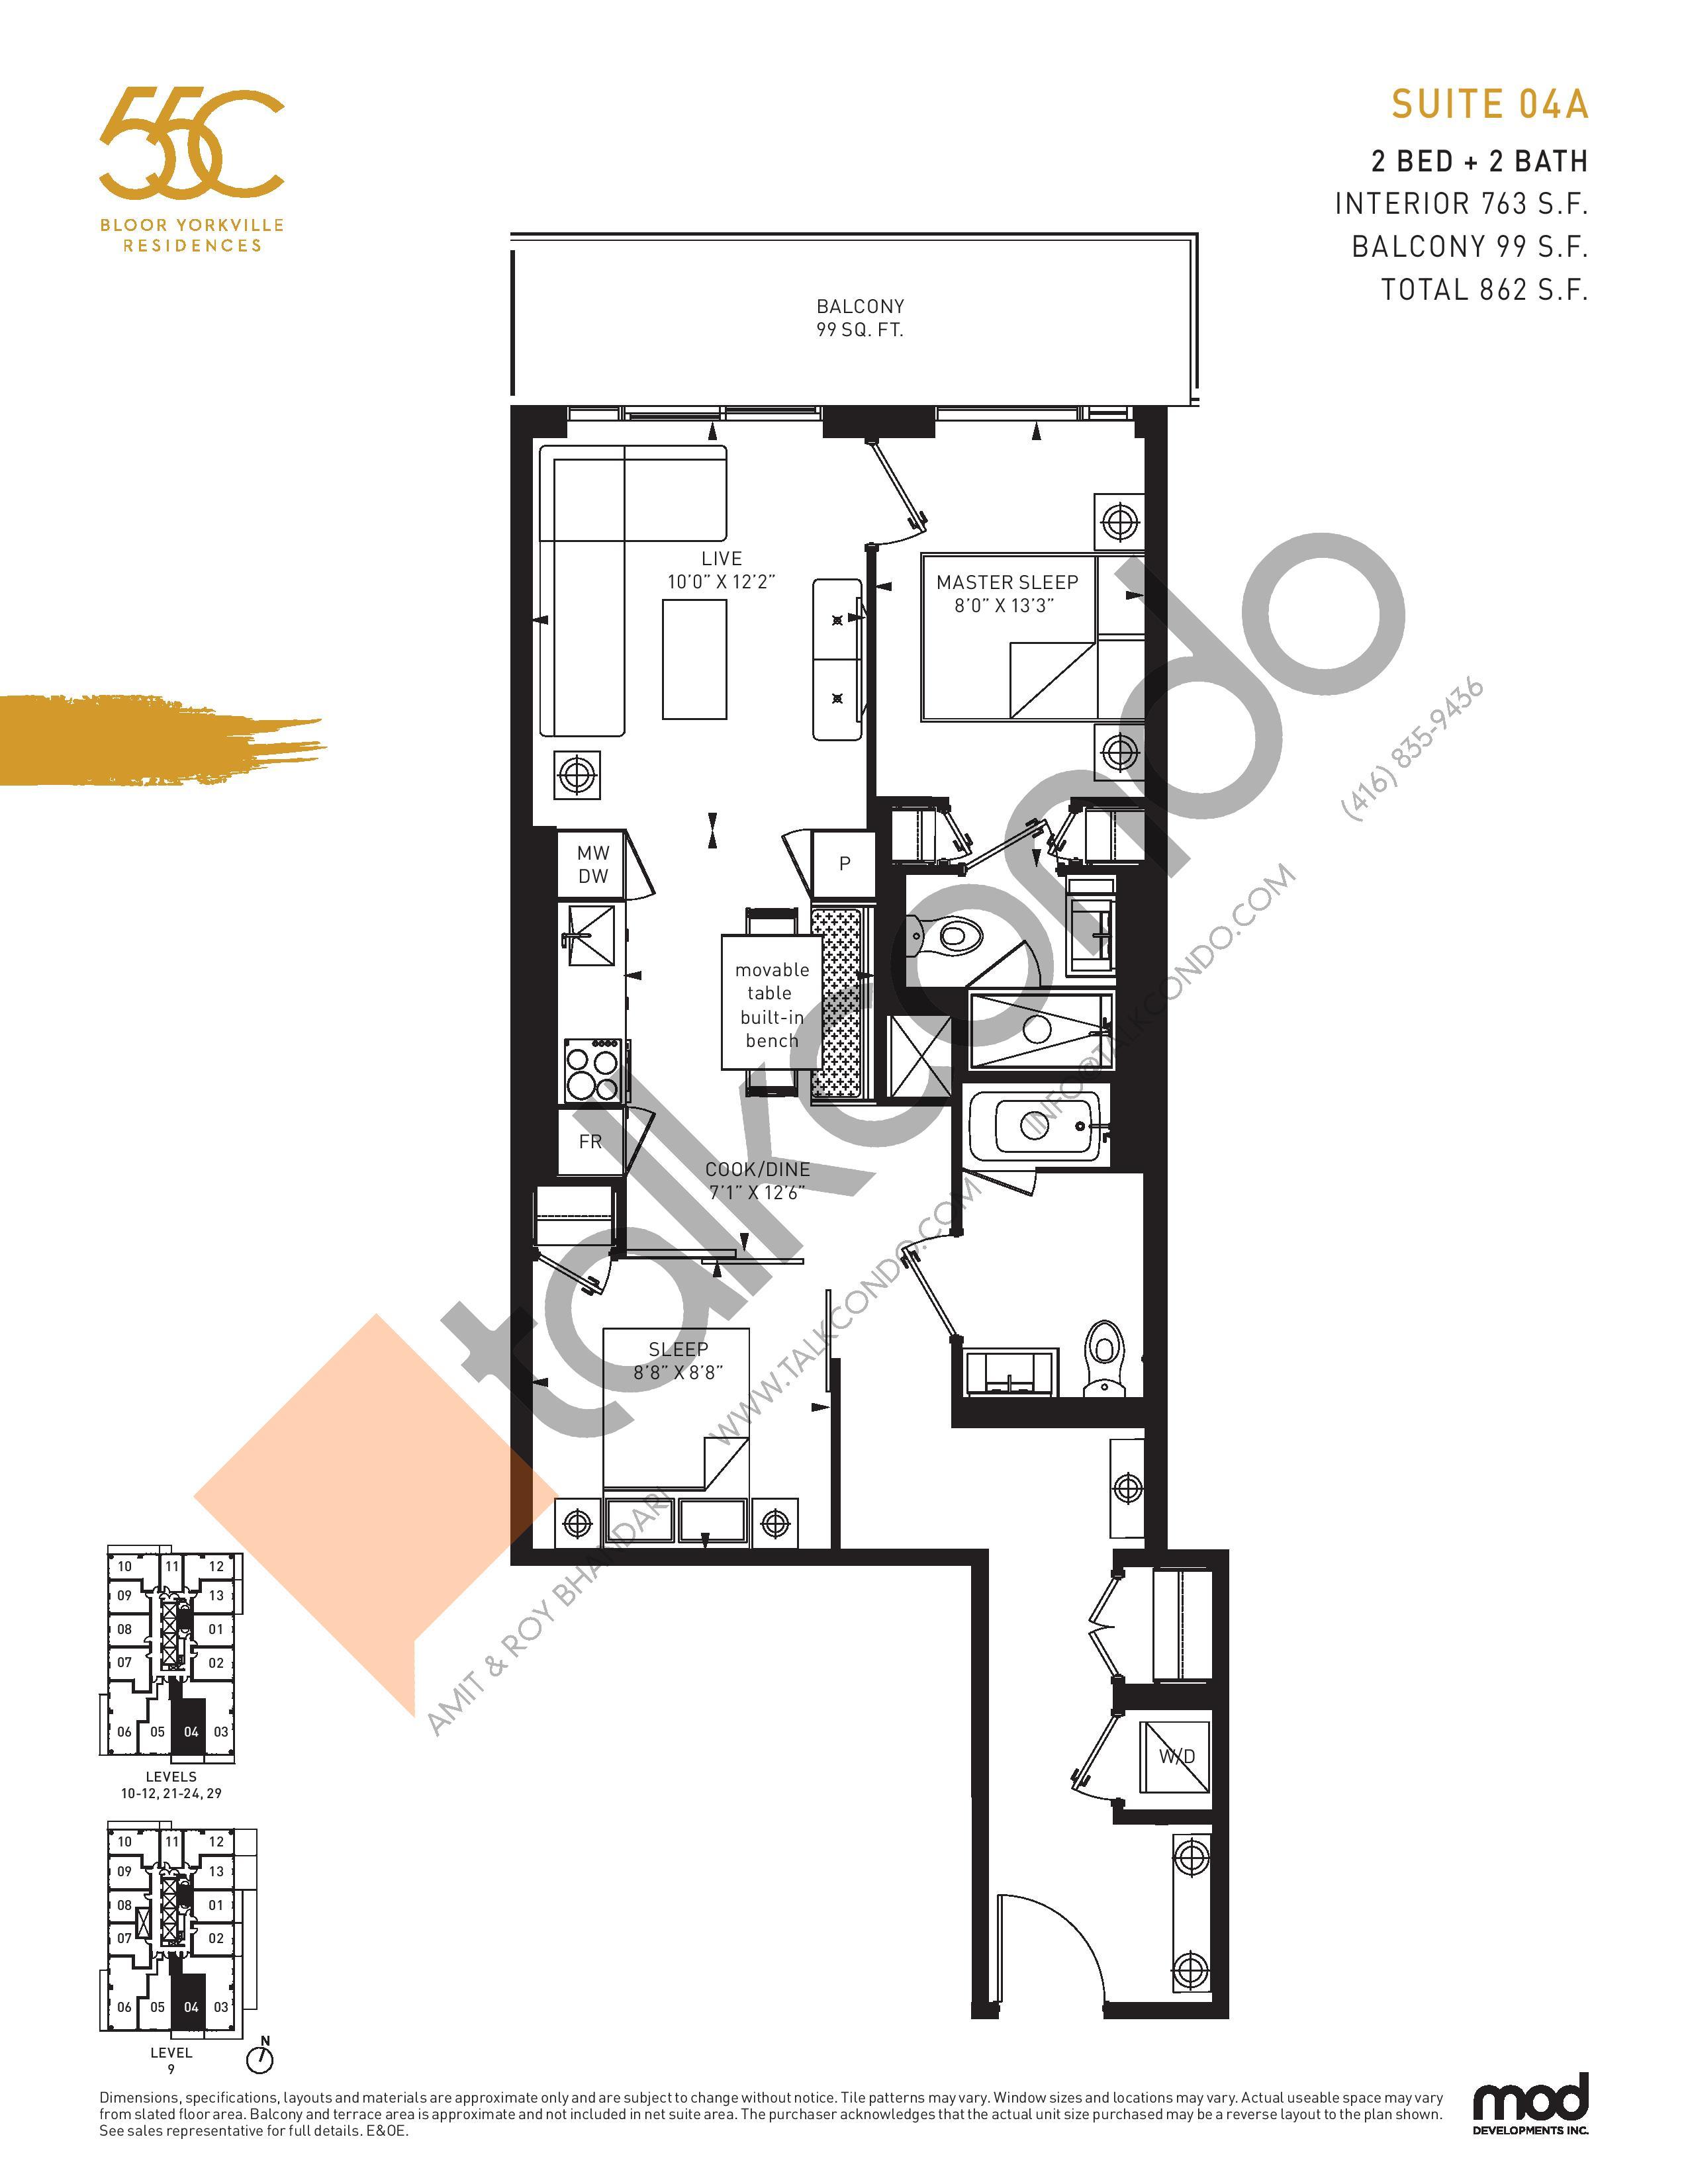 Suite 04A Floor Plan at 55C Condos - 763 sq.ft